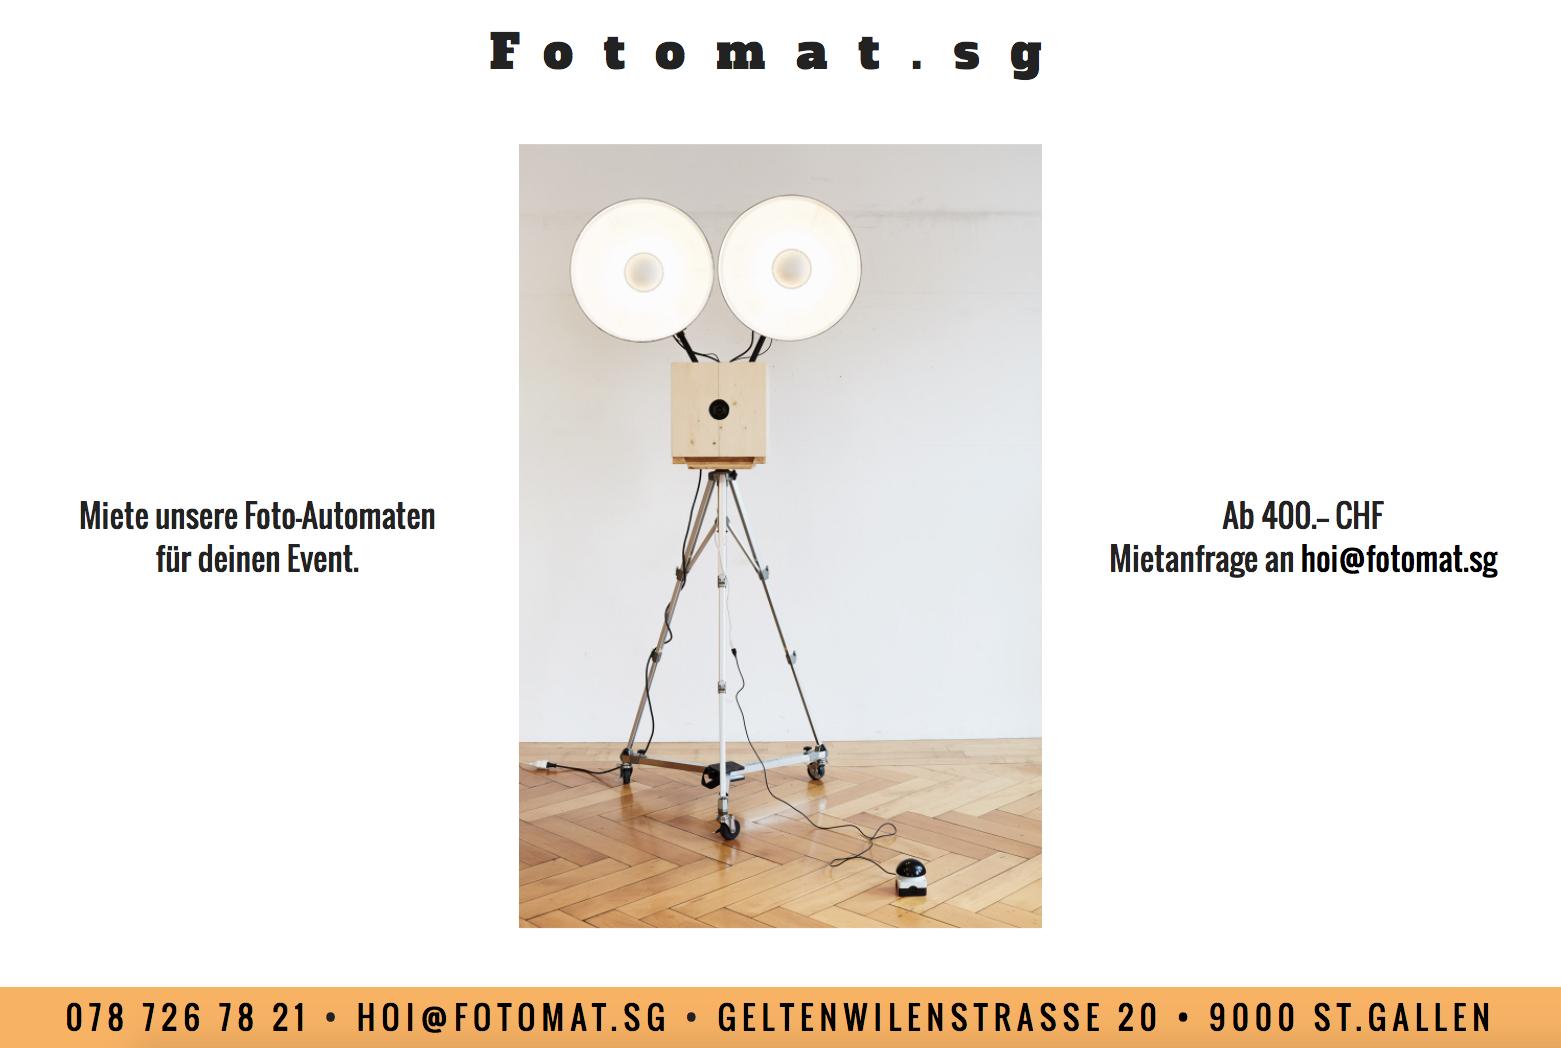 Fotoautomaten / Photobooth / Fotobox ->  www.fotomat.sg